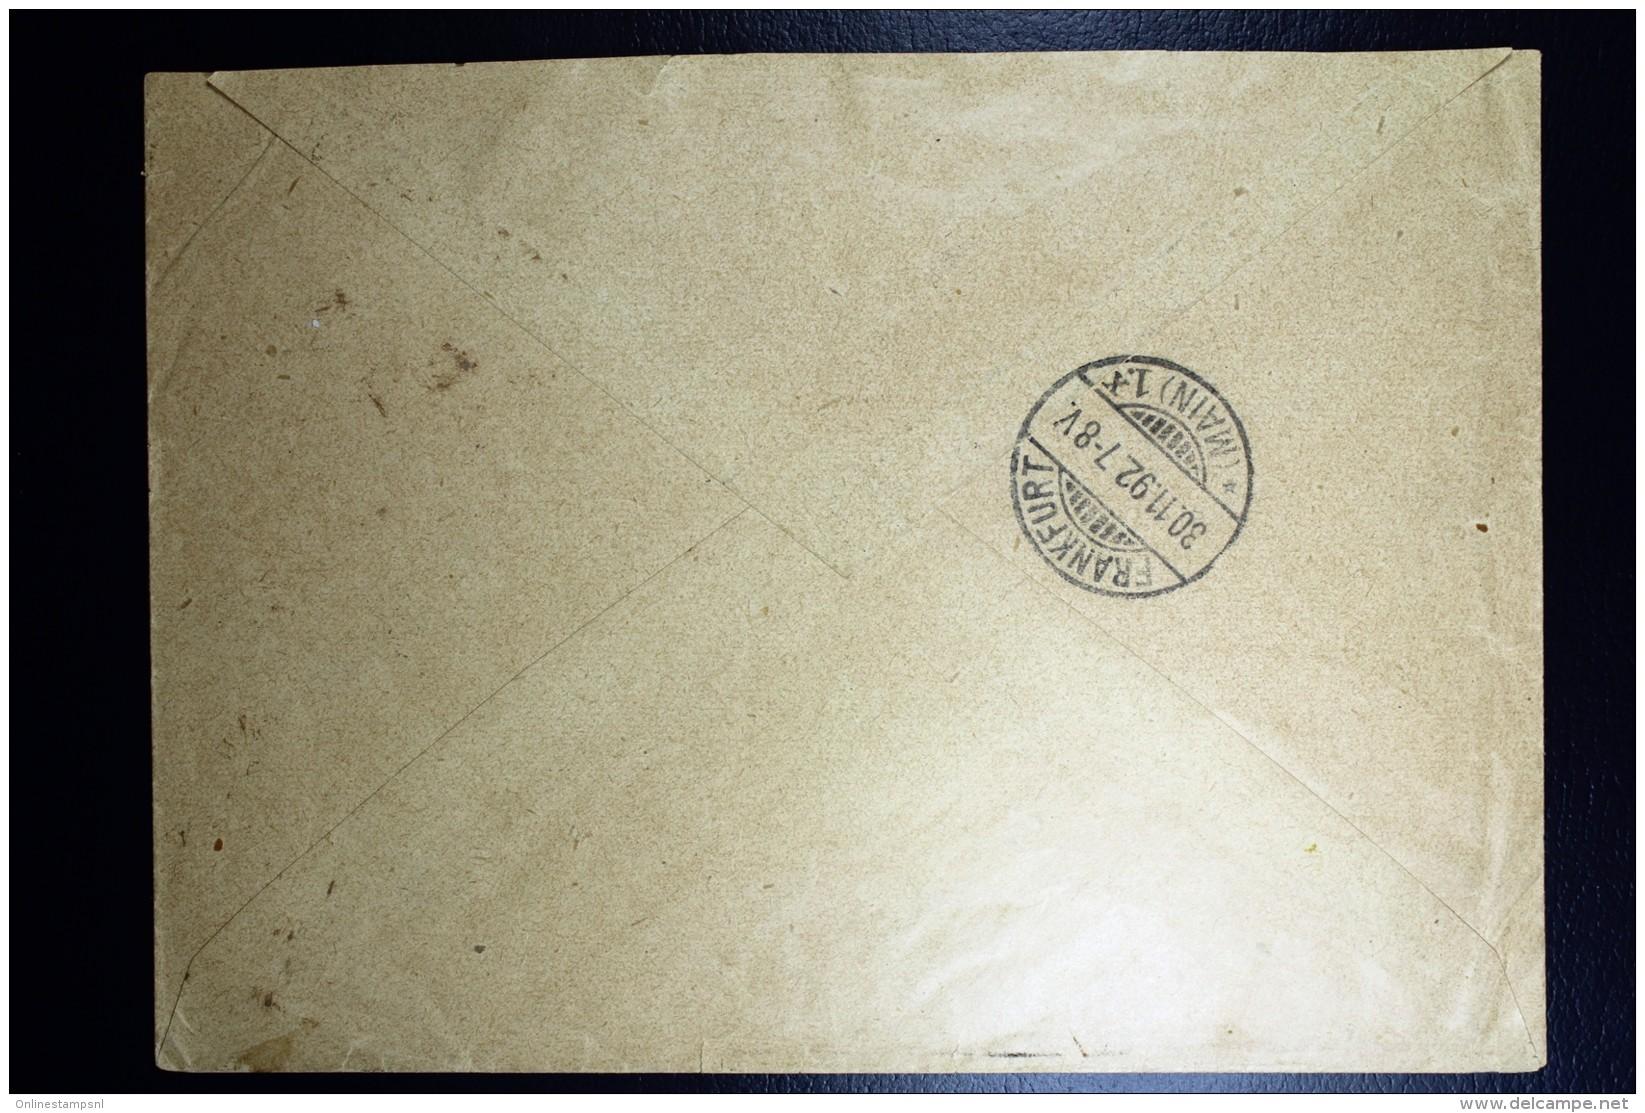 Nederland Enveloppe Amsterdam Frankfurt  Mengfrankering  NVPH 33 + 37  1892 - Periode 1891-1948 (Wilhelmina)